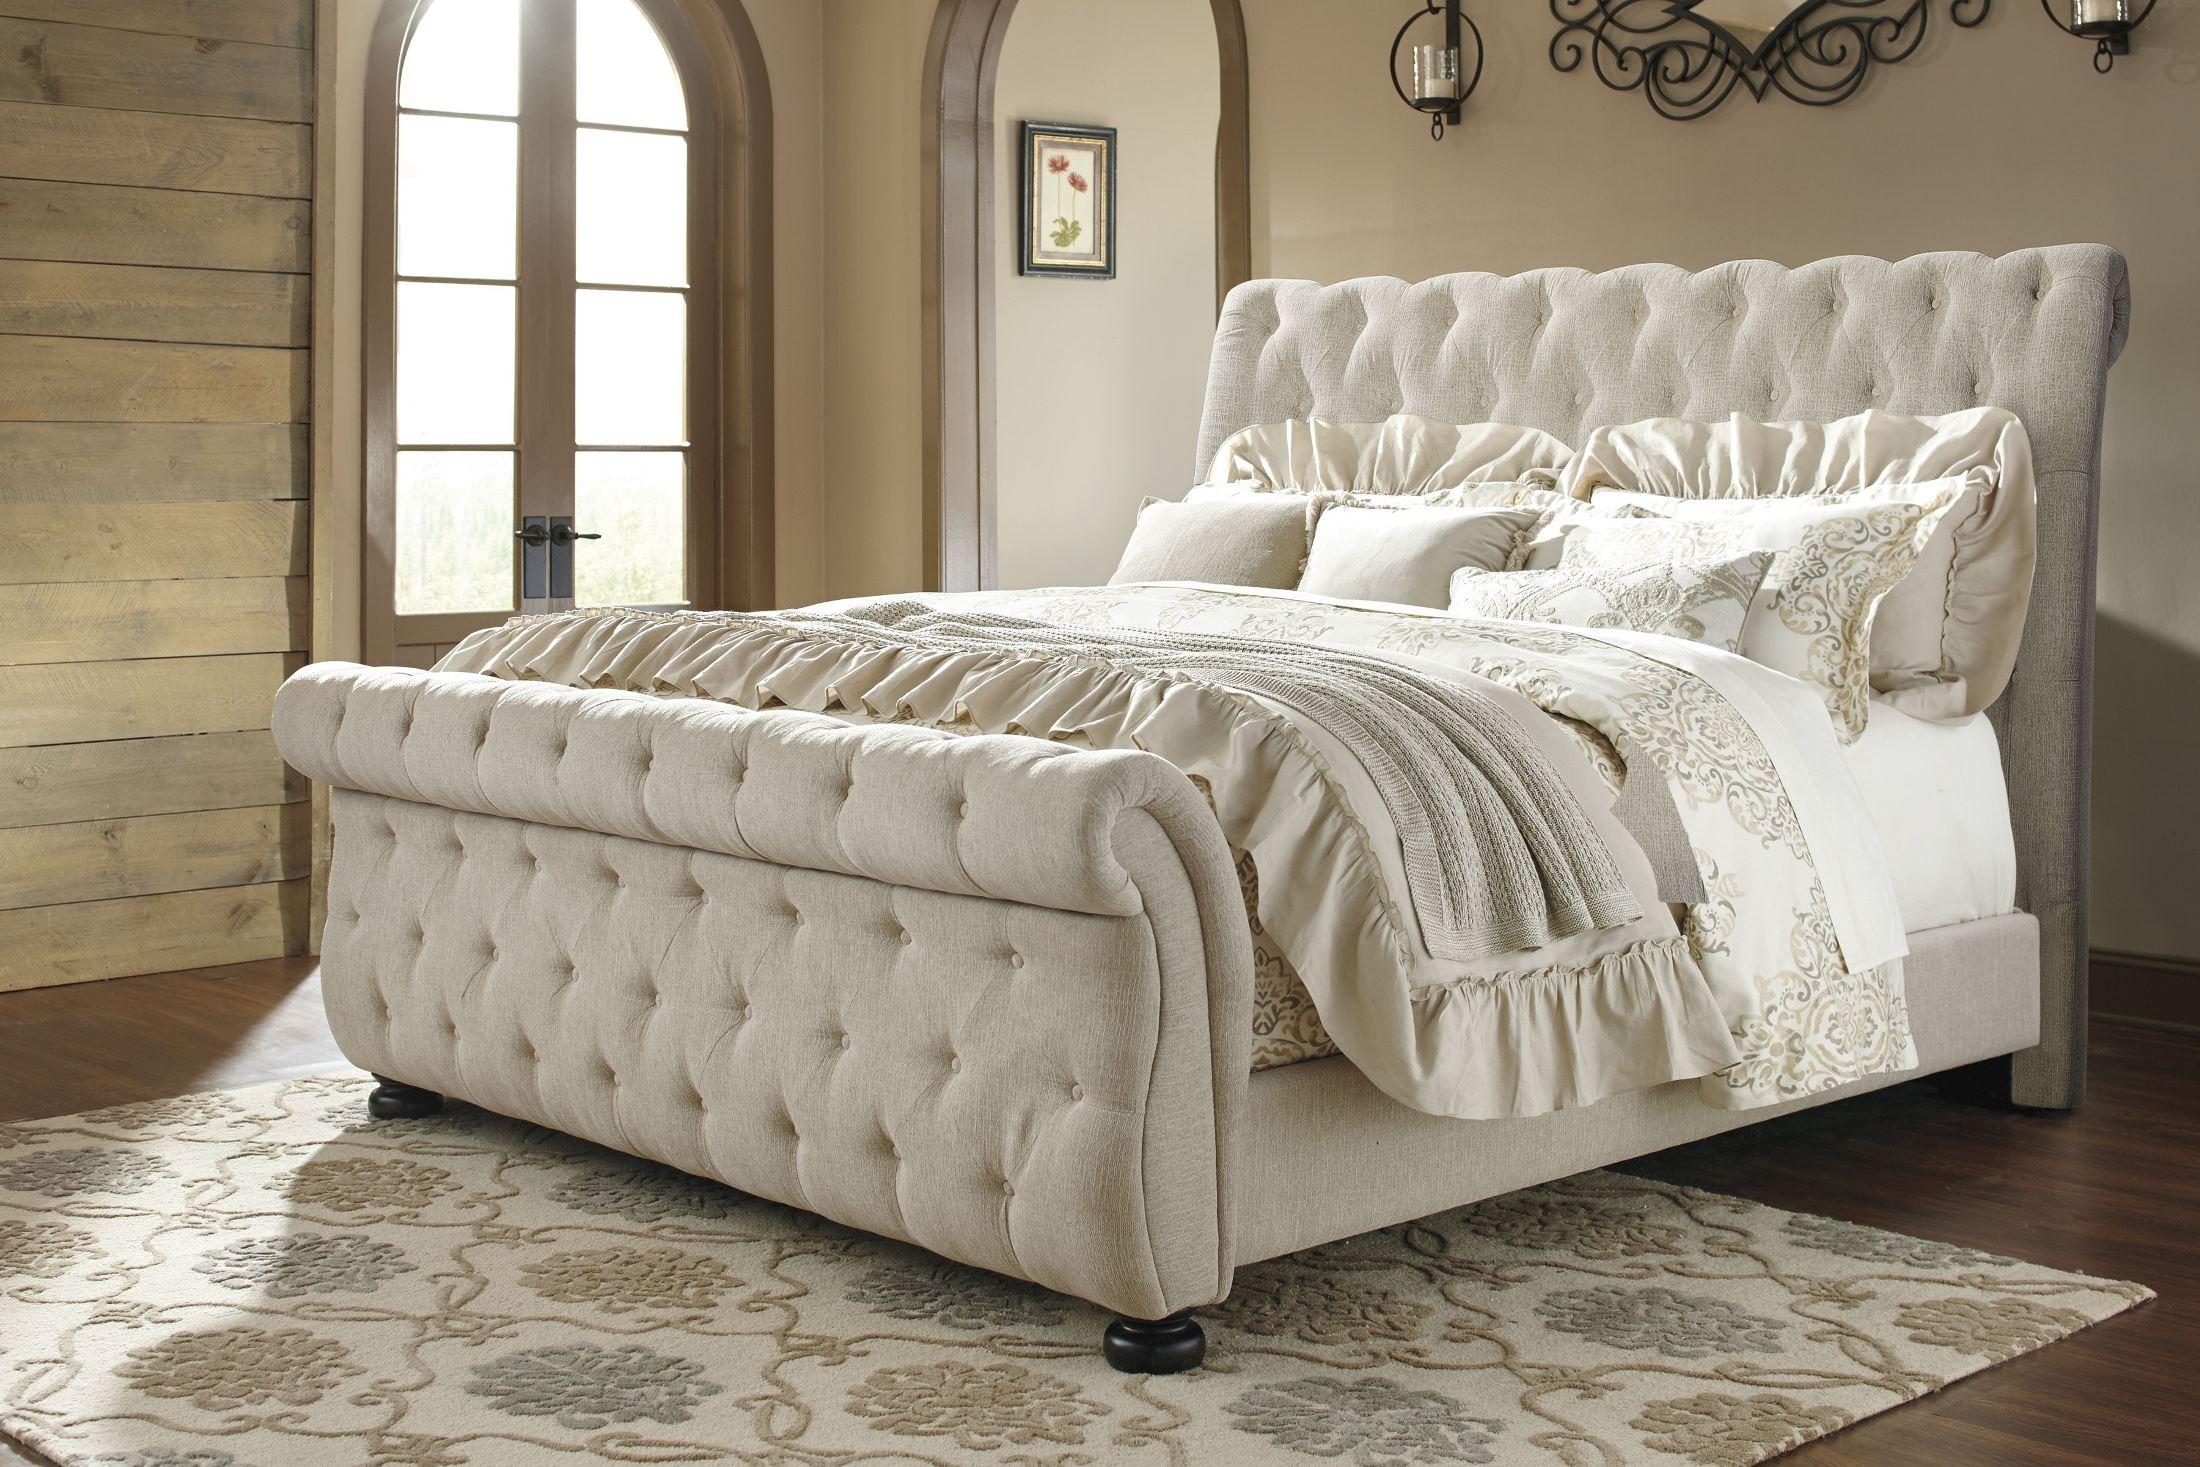 Willenburg Linen Queen Upholstered Sleigh Bed from Ashley